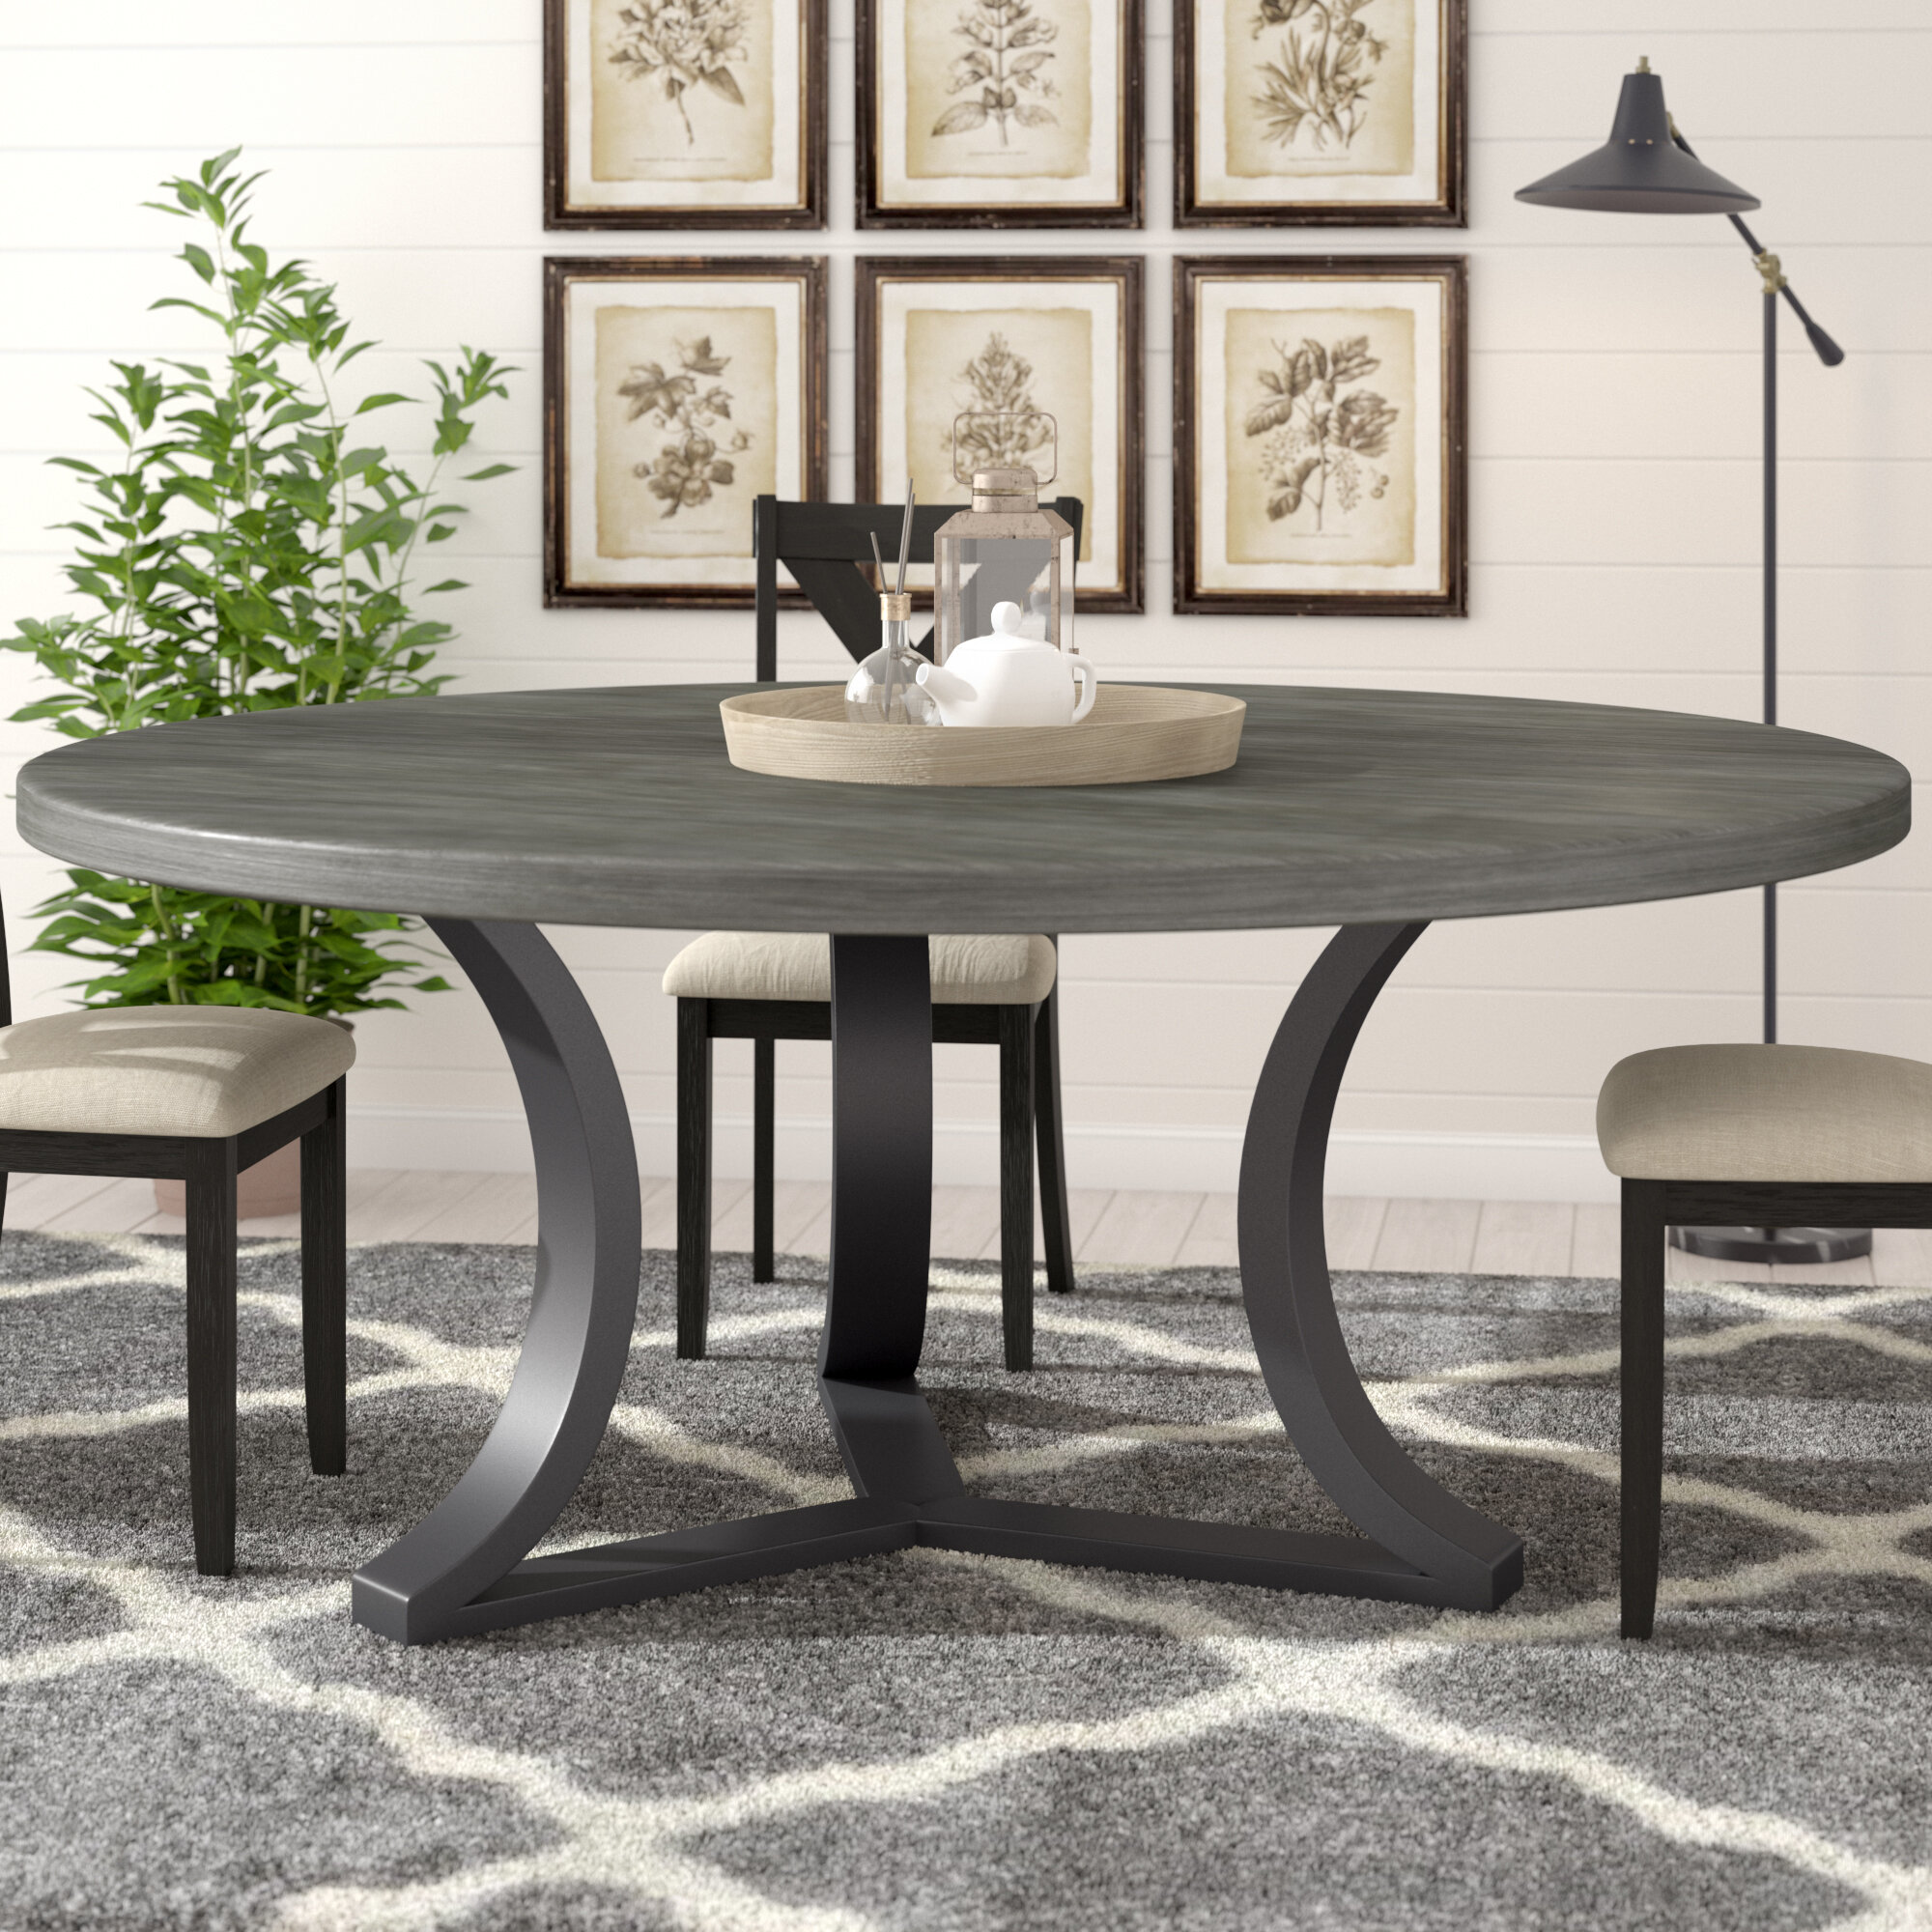 Gracie oaks louisa dining table reviews wayfair